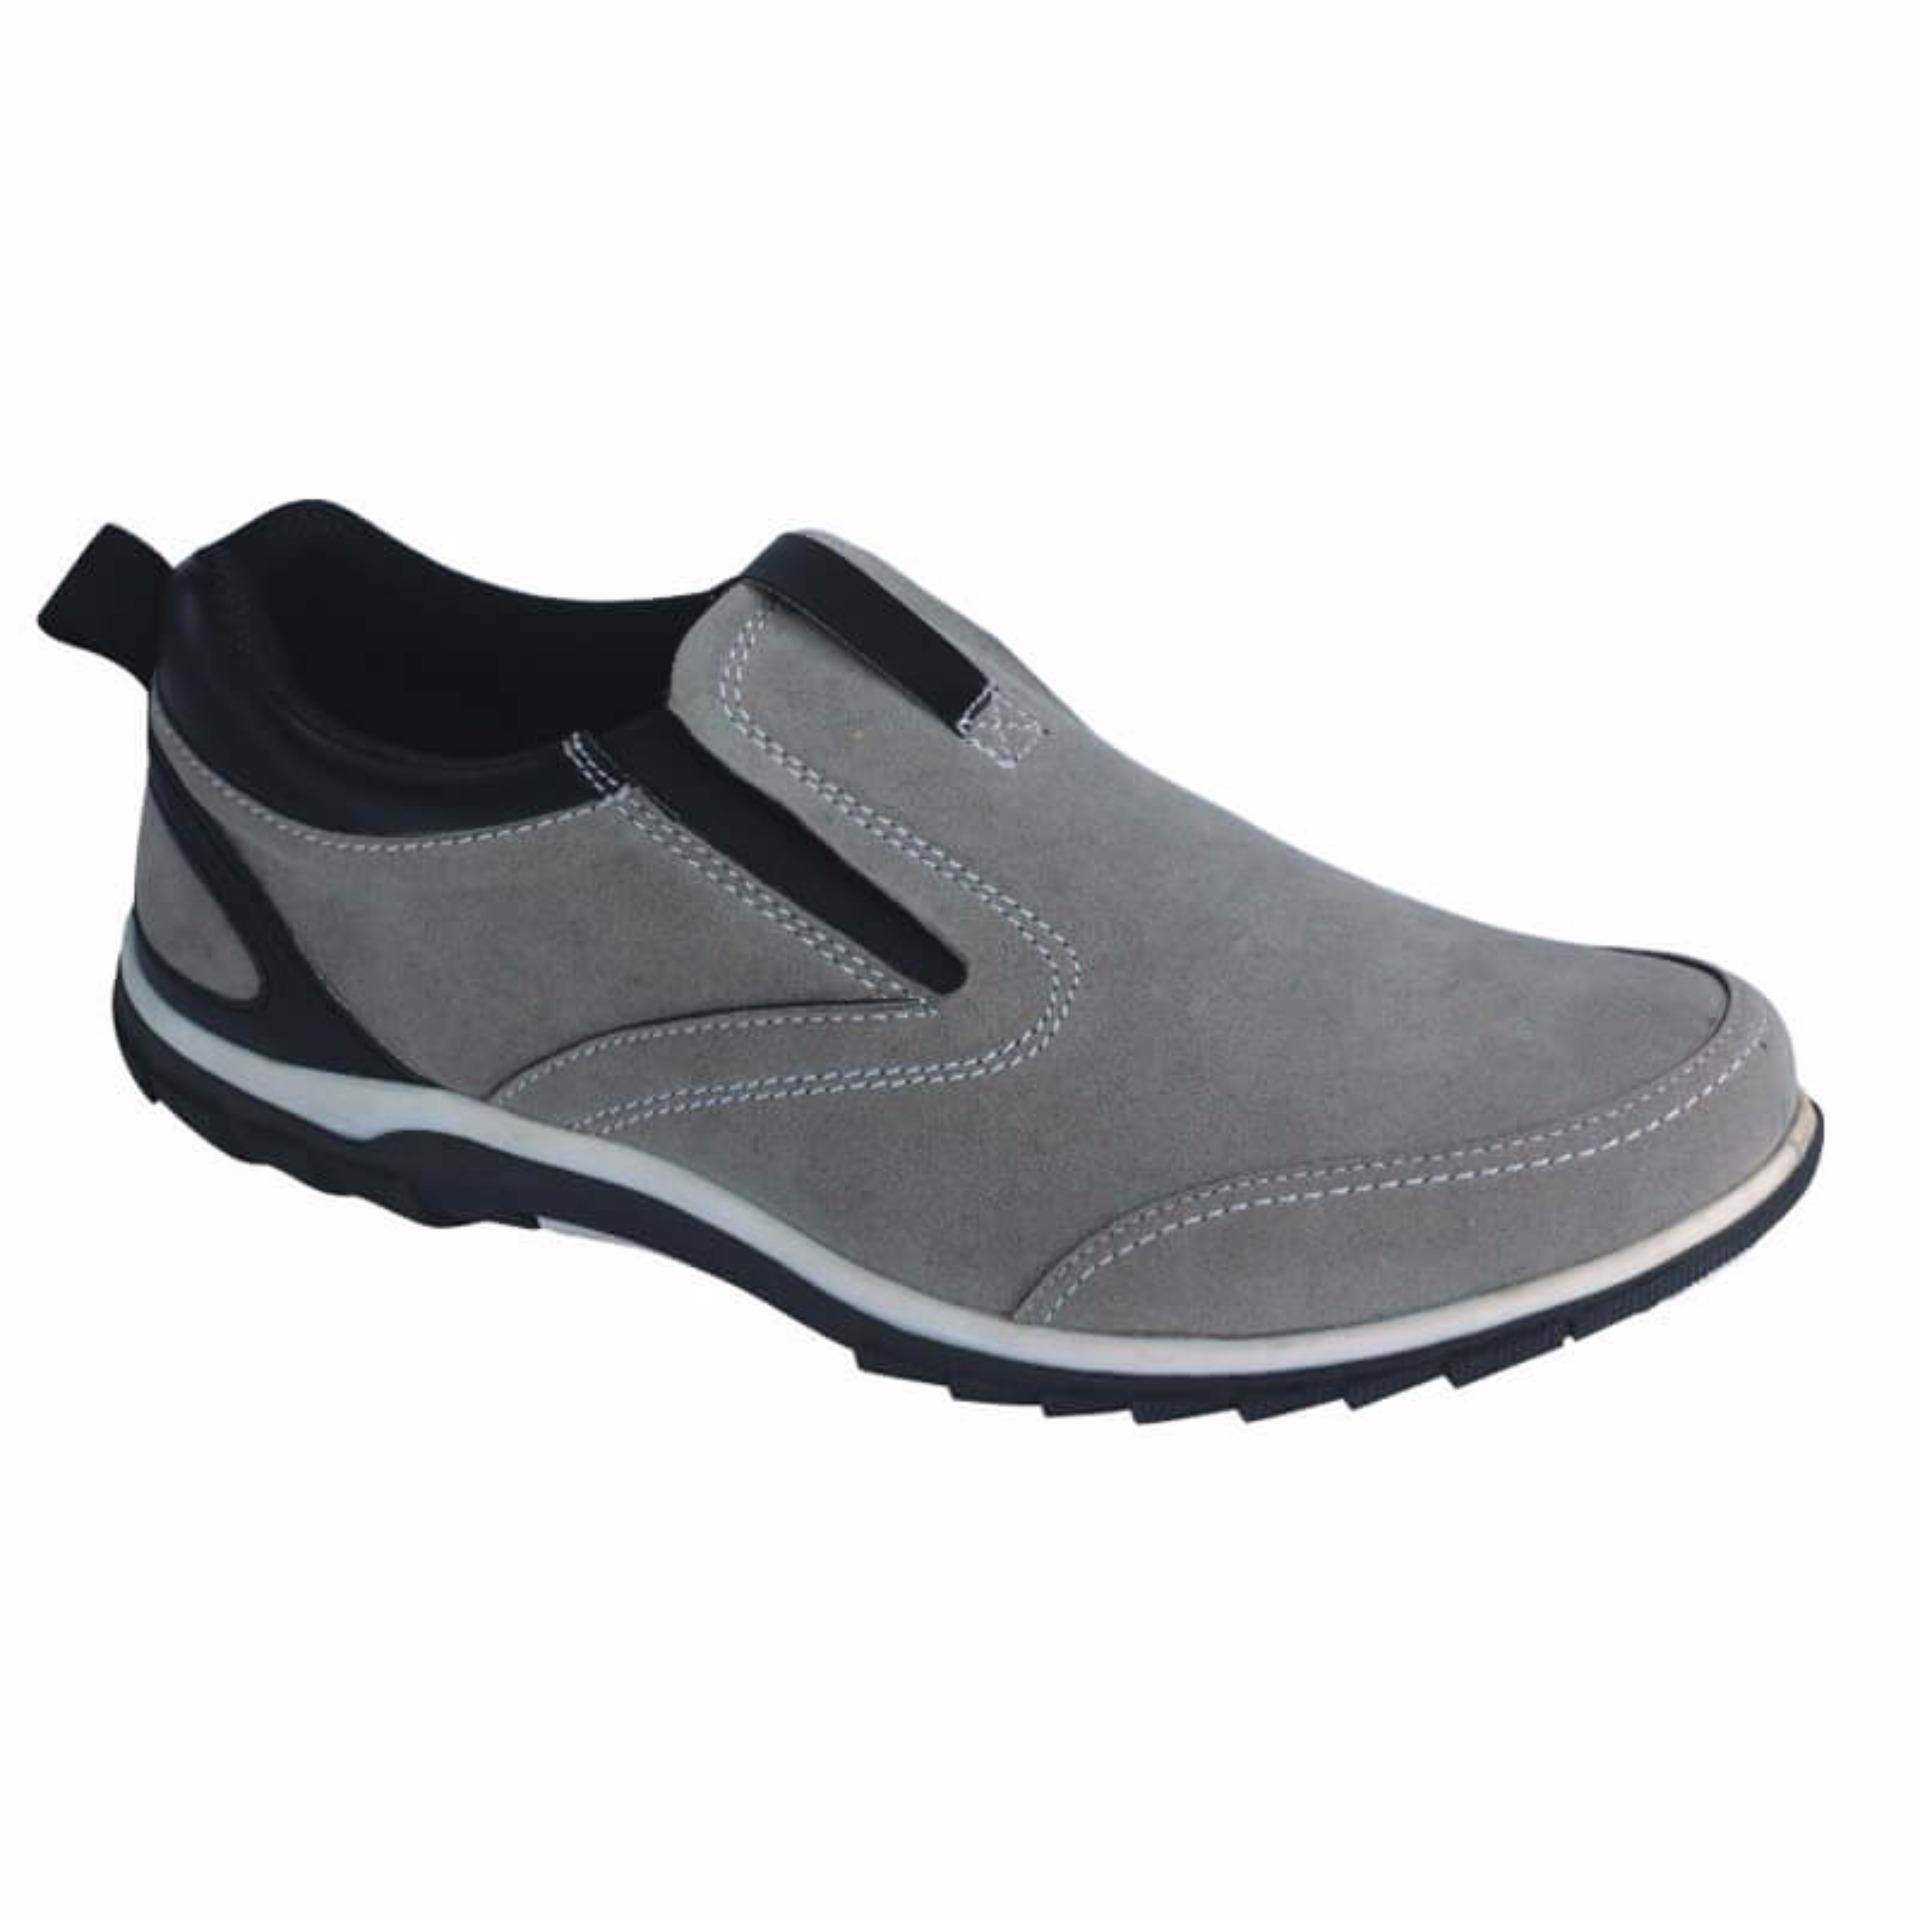 Harga Sepatu Slip On Sneakers Casual Pria Sd 008 New